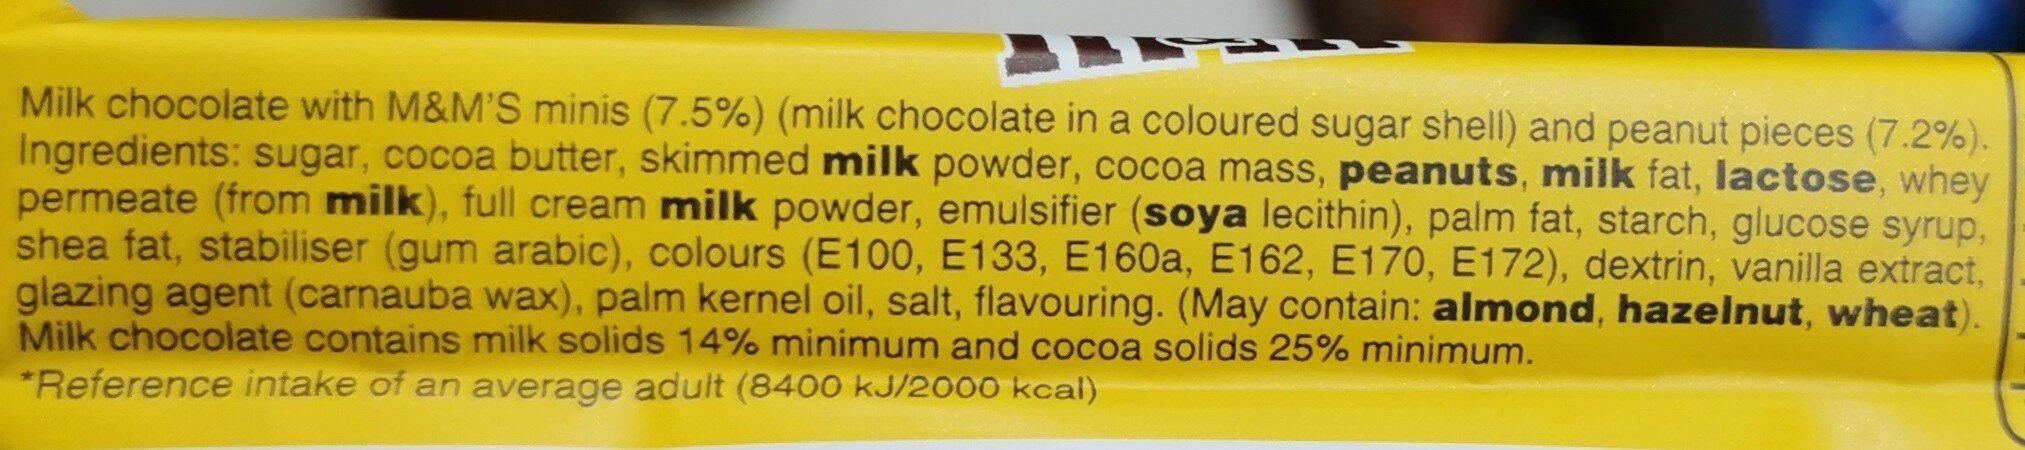 Barretta mem's peanut - Ingredients - en